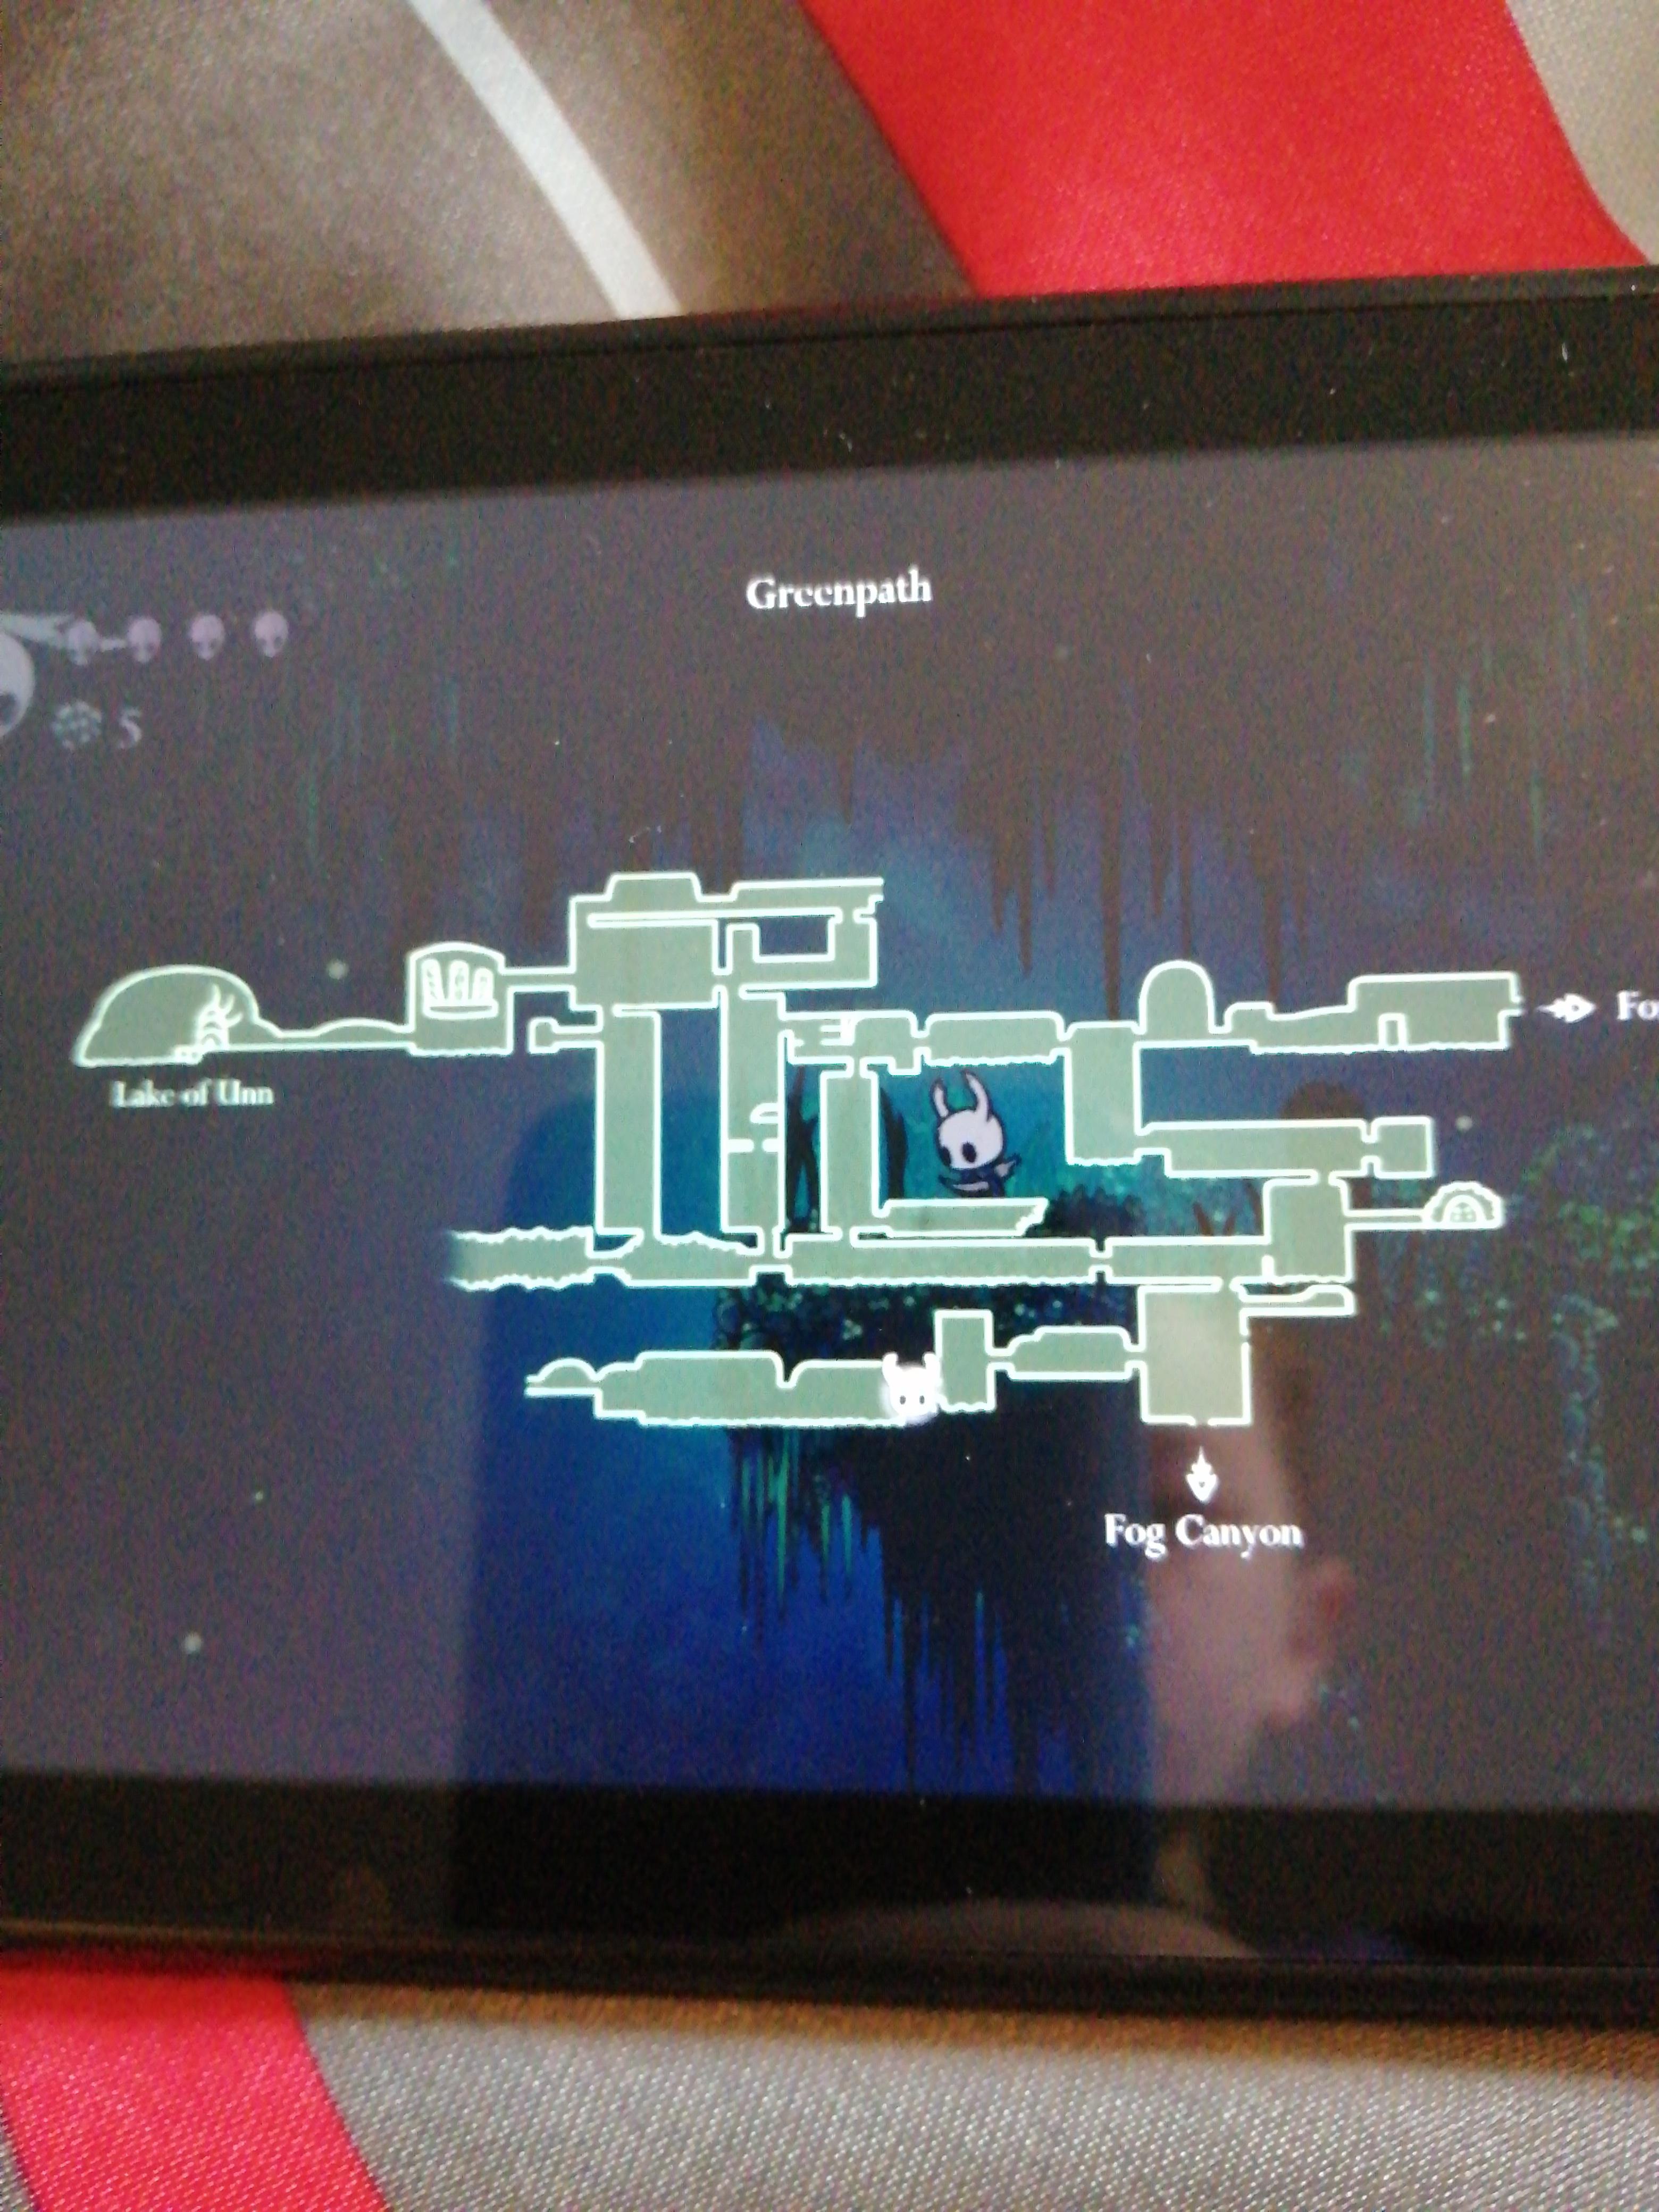 Greenpath Map Hollow Knight : greenpath, hollow, knight, Greenpath, Which, Should, Thanks, HollowKnight